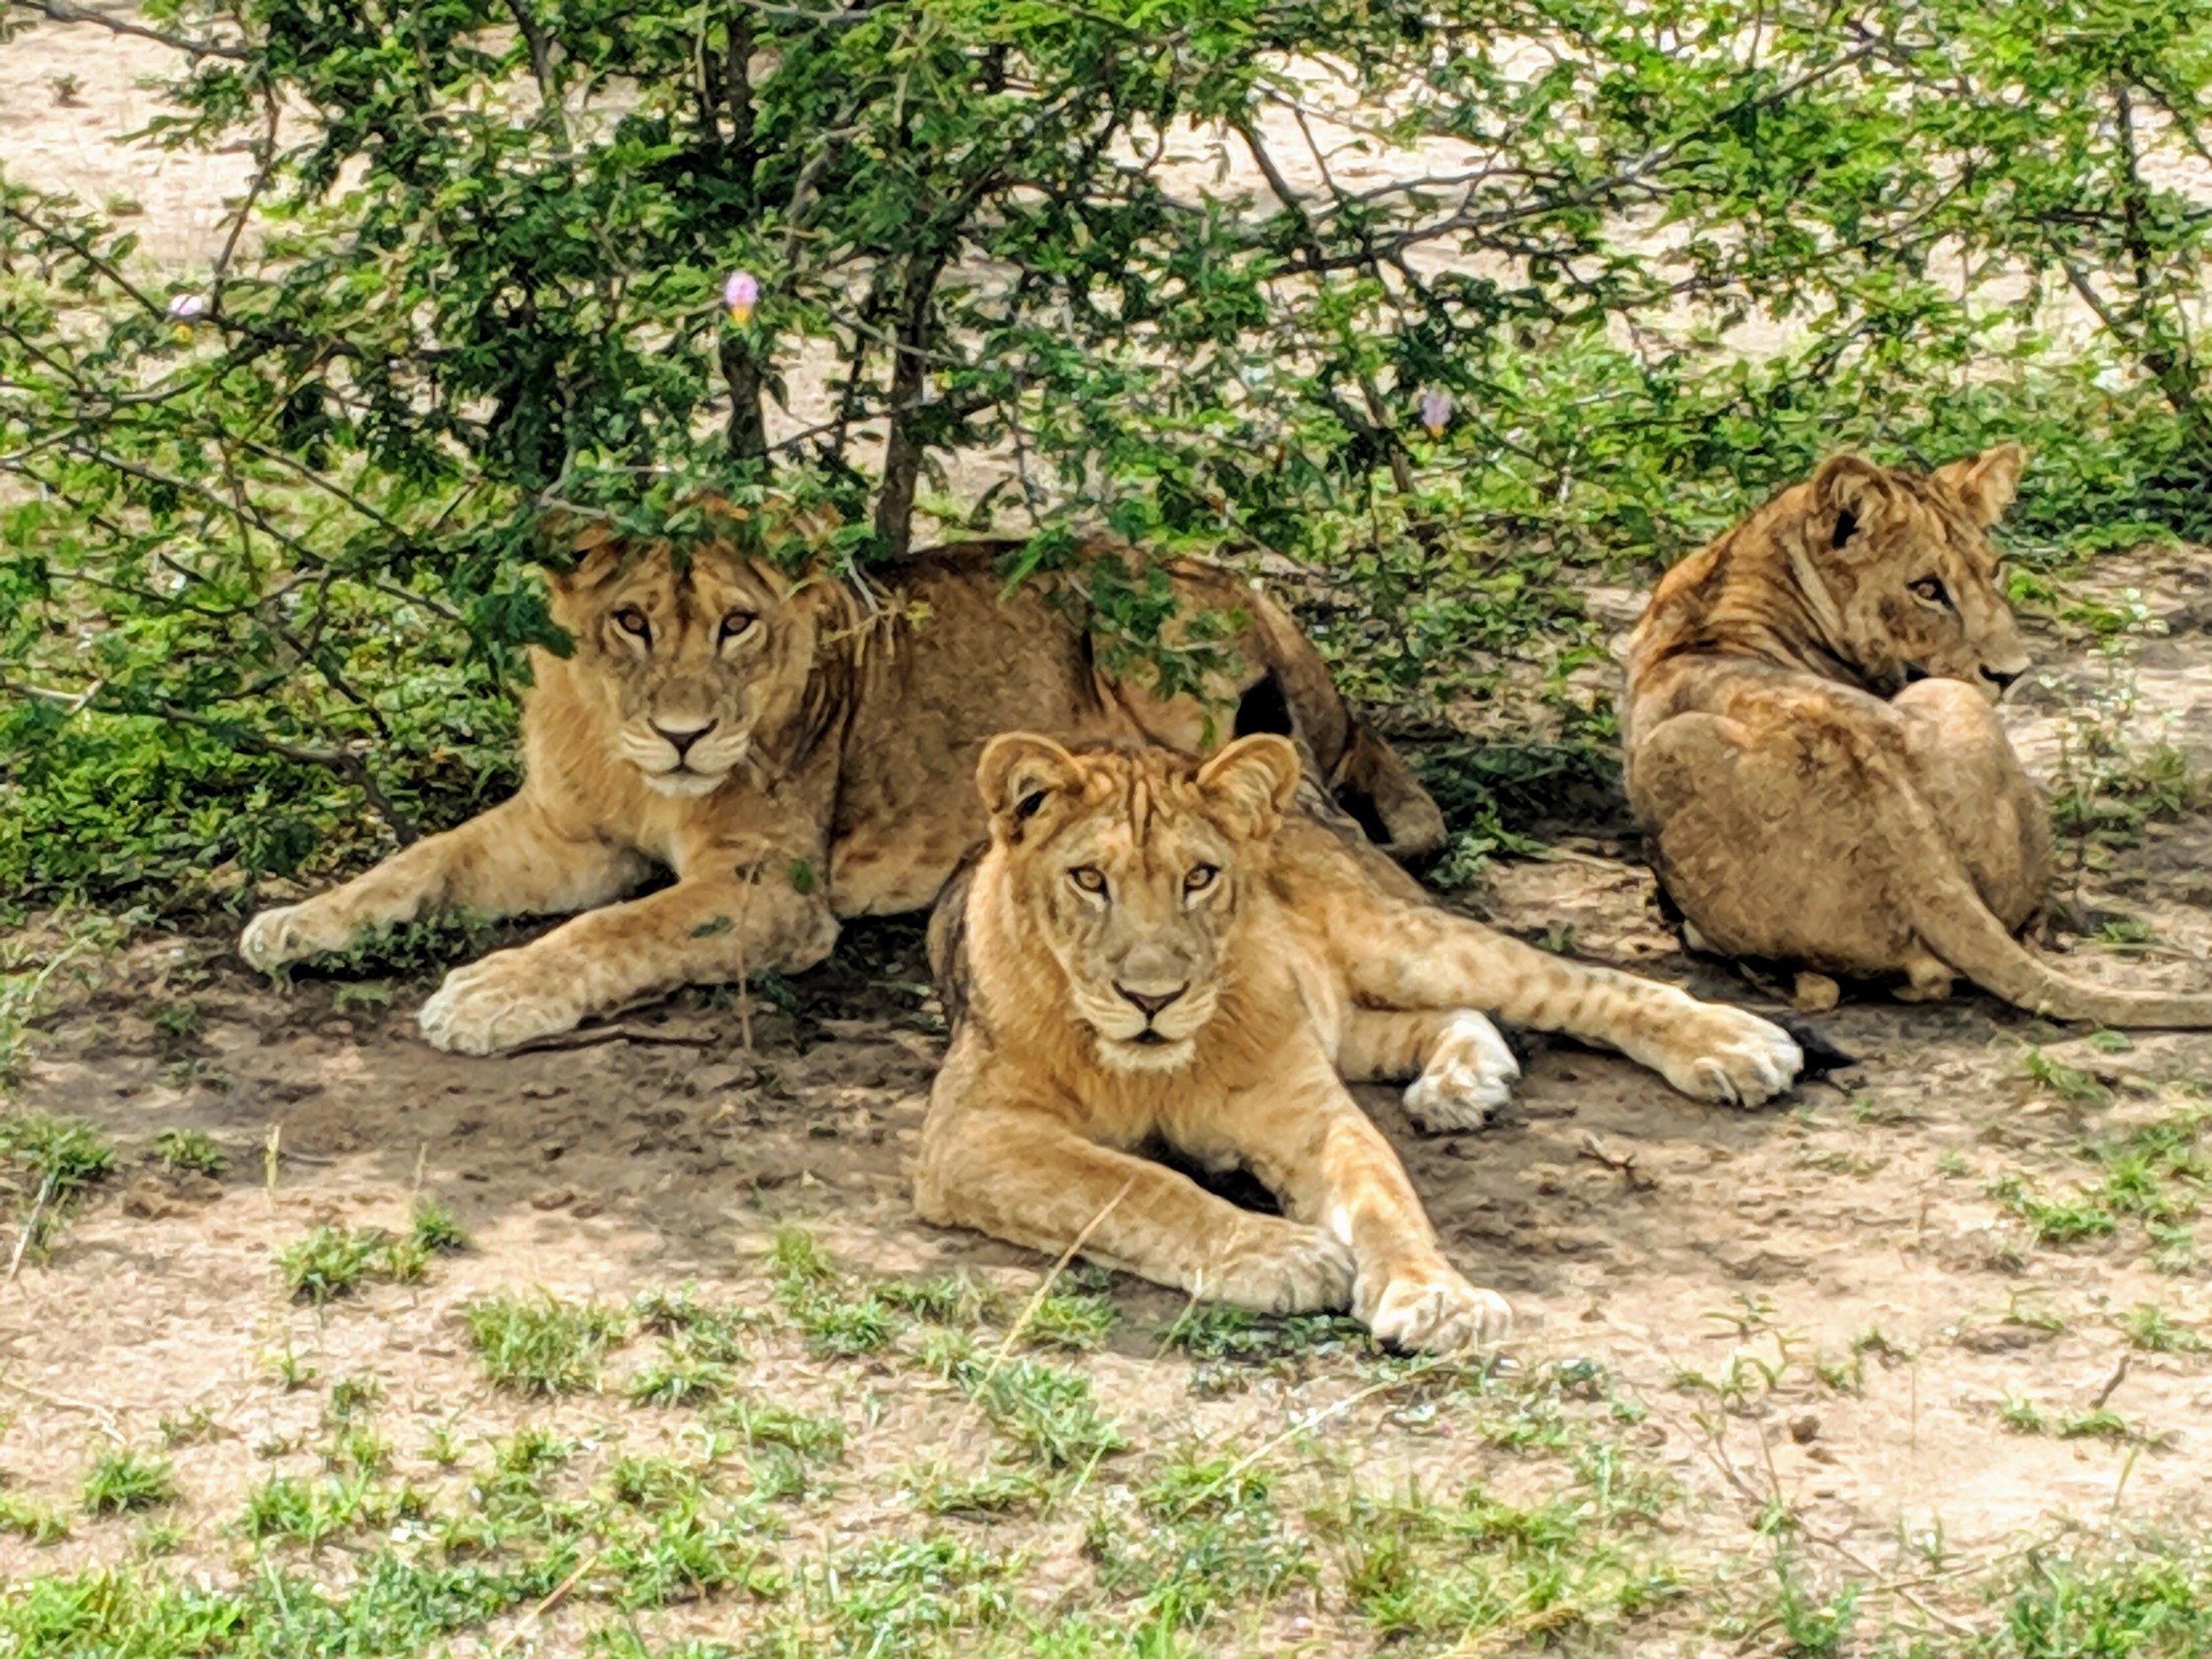 Lions in Queen Elizabeth National Park. Photographer: Elisabeth Engl